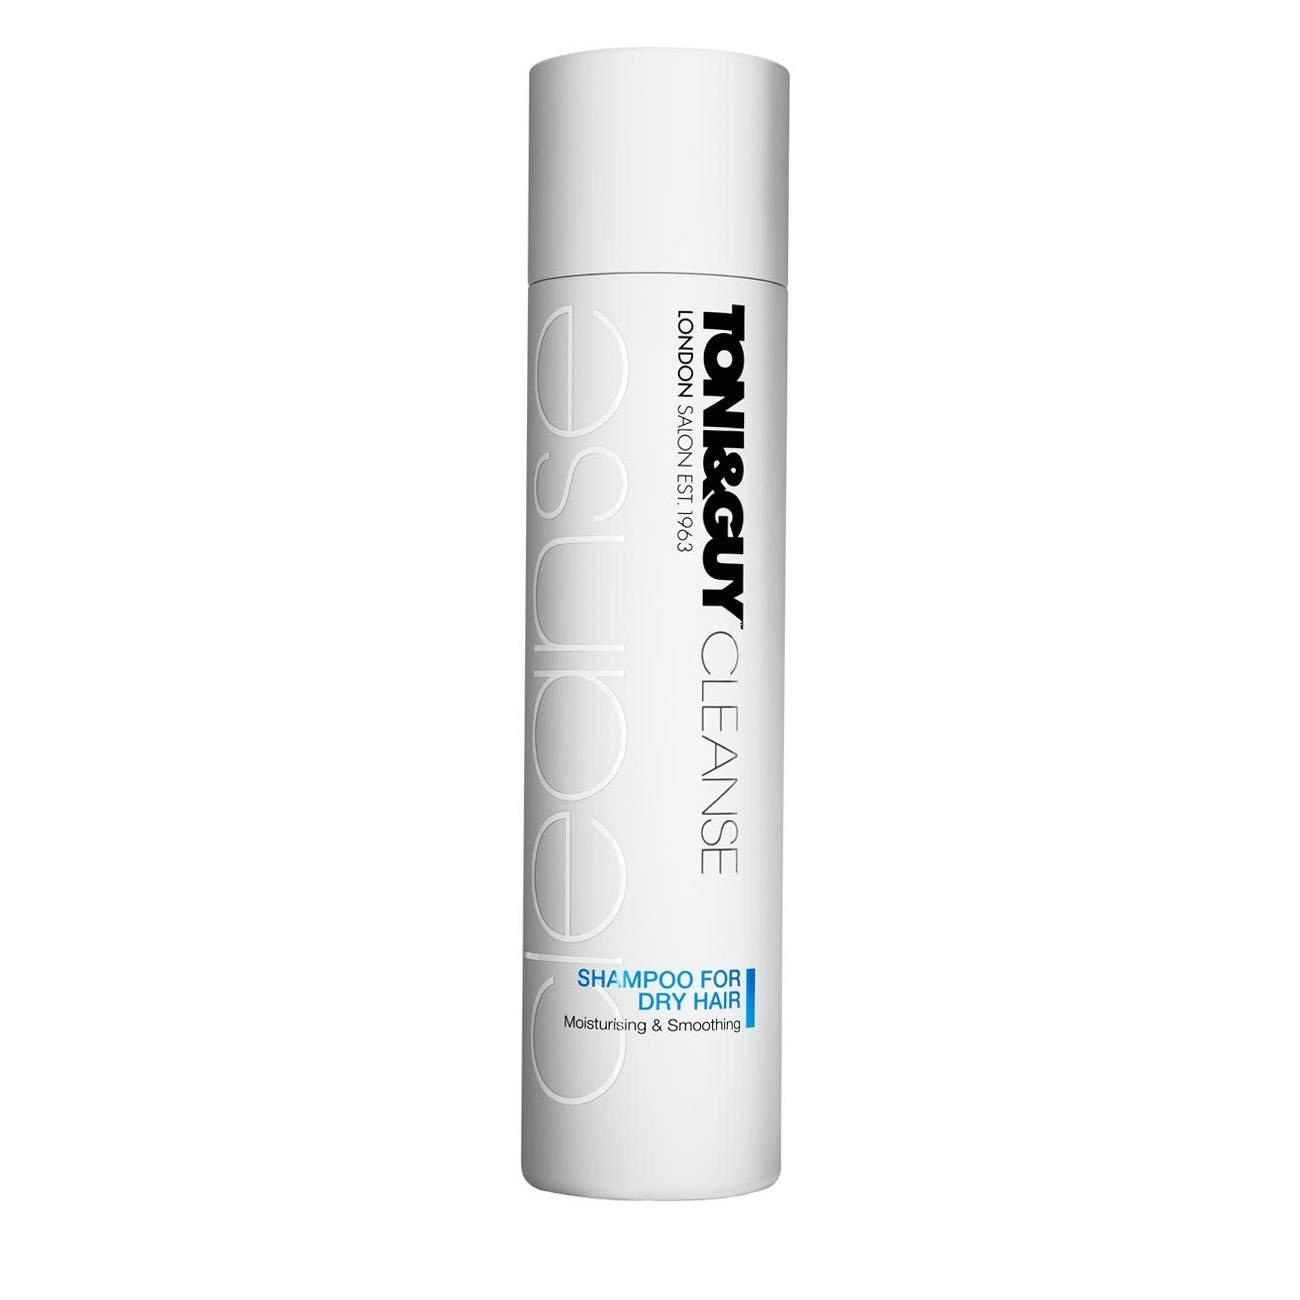 Cleanse Shampoo For Dry Hair 250ml Toni & Guy imagine 2021 bestvalue.eu